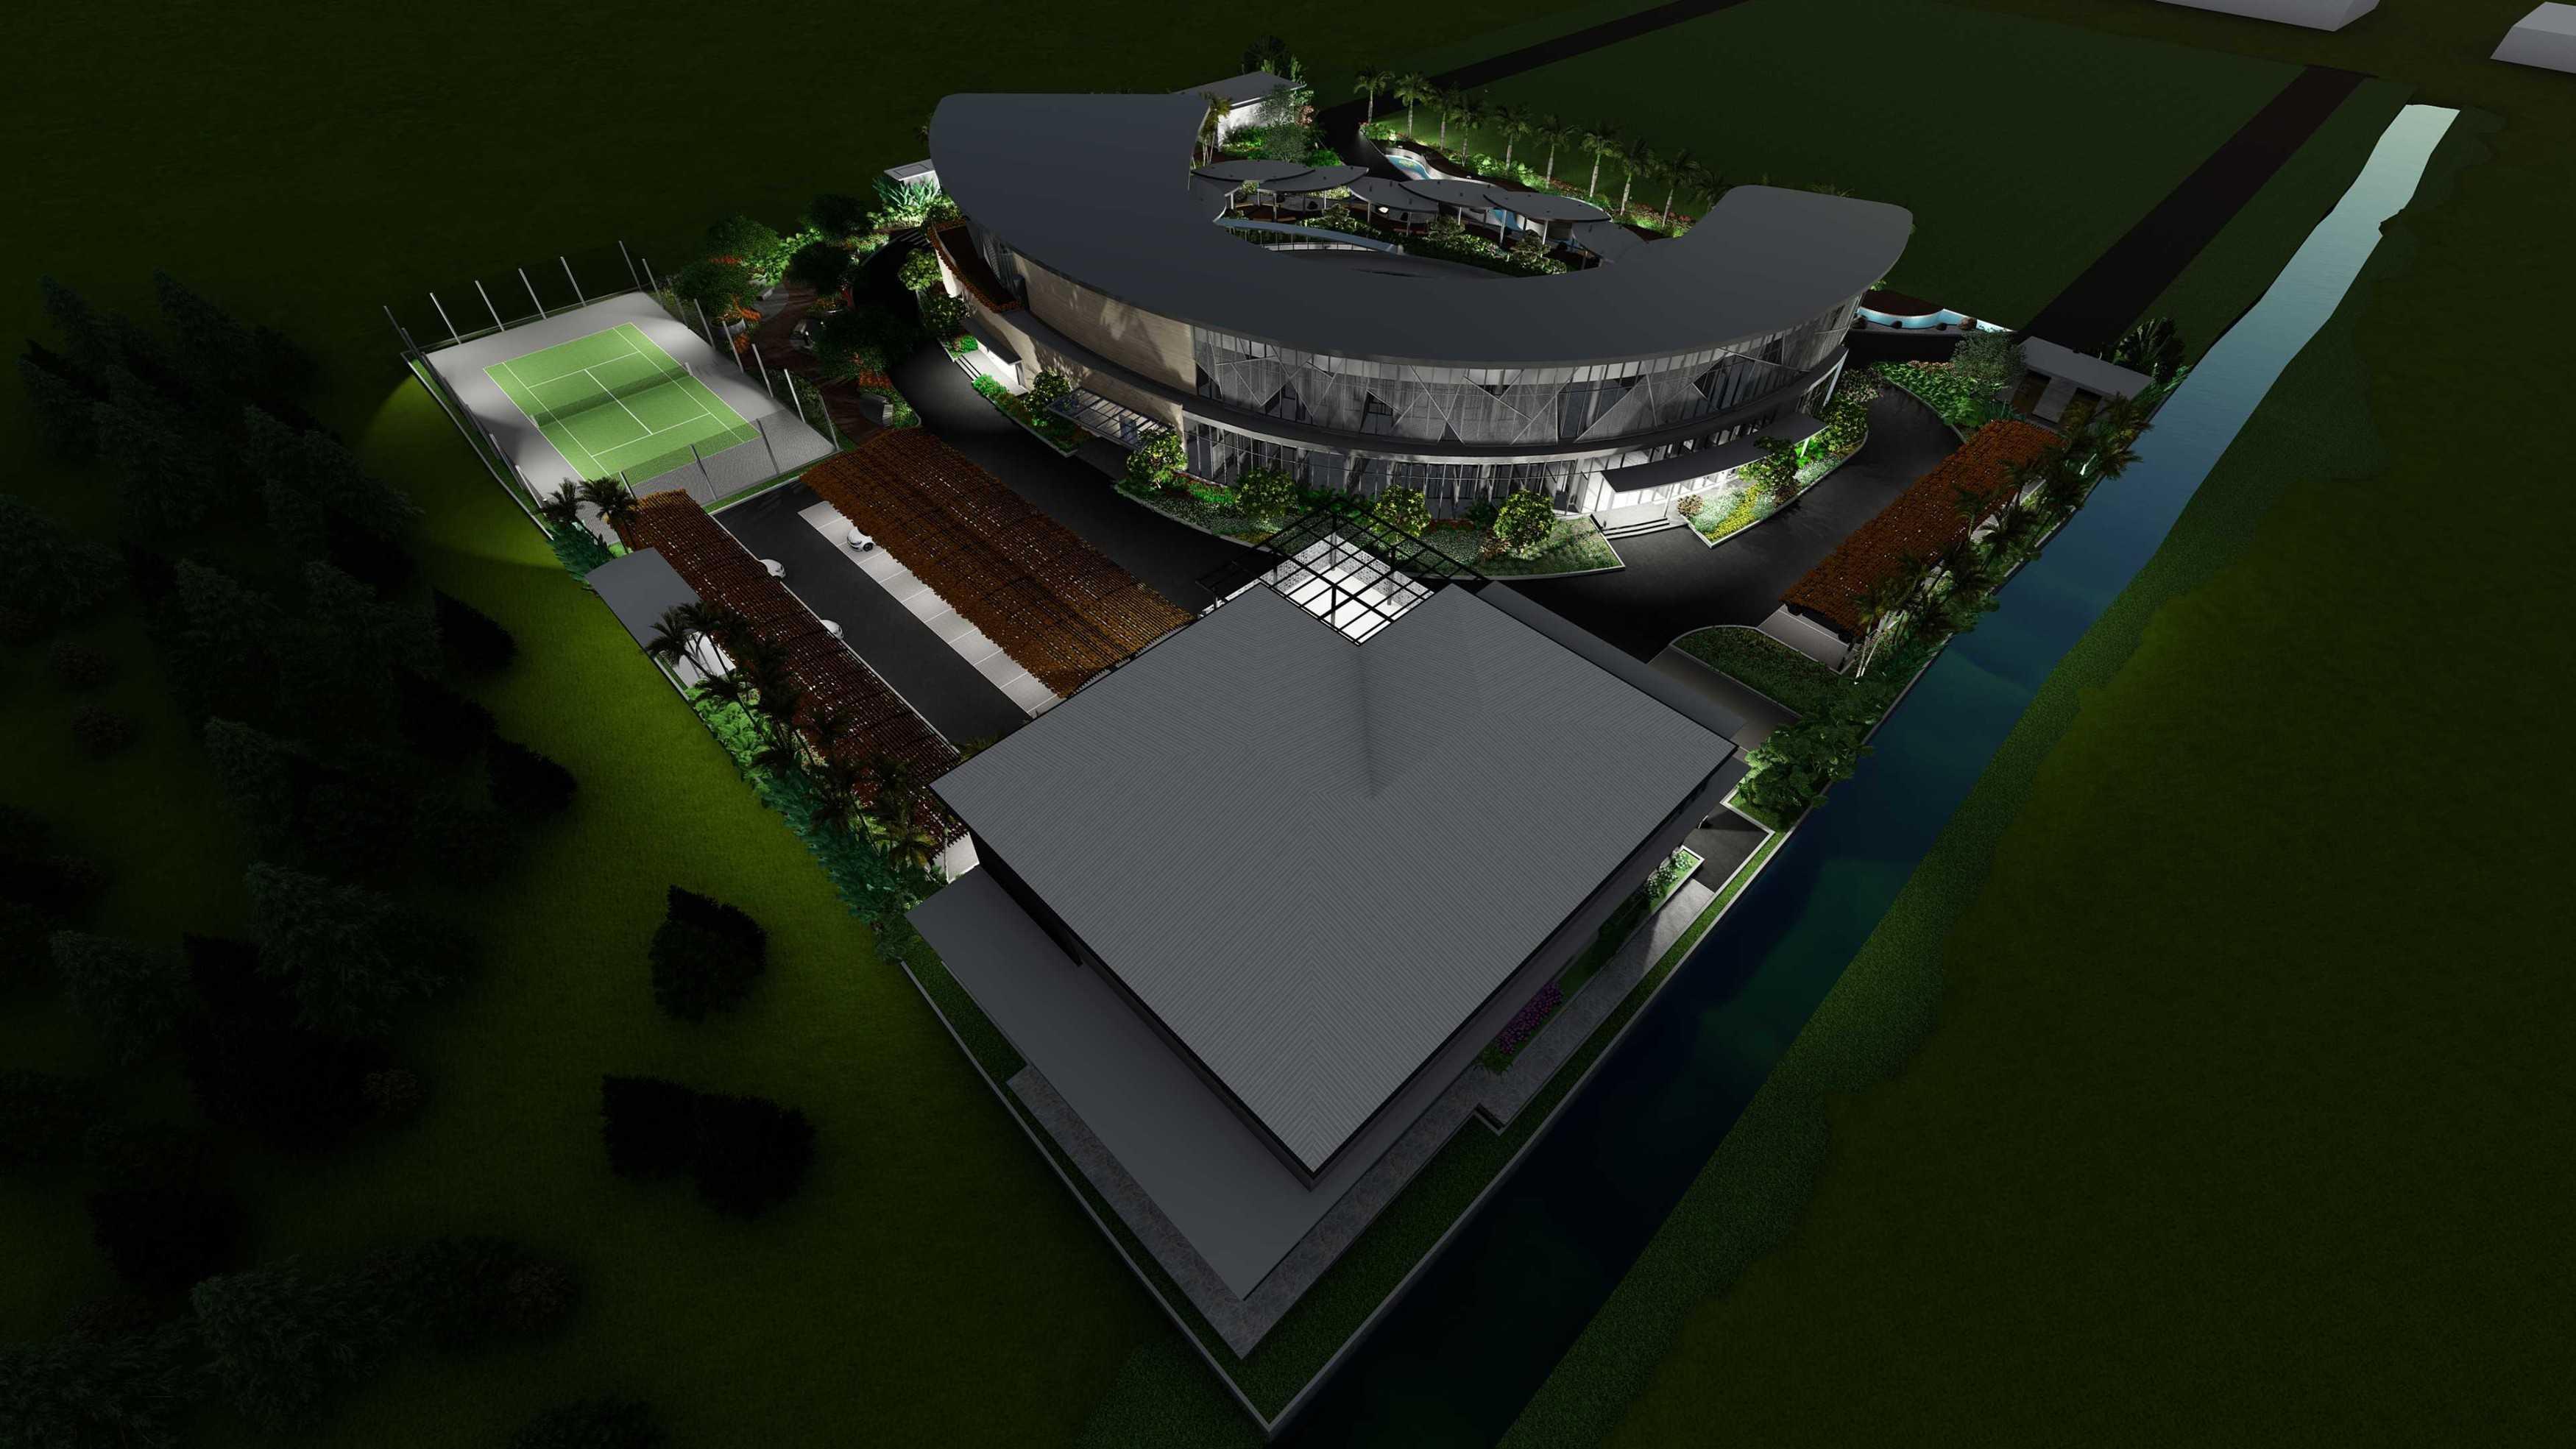 Raaj Gill Arsitek Aari Office Building & Laboratory Pekanbaru, Kota Pekanbaru, Riau, Indonesia Pekanbaru, Kota Pekanbaru, Riau, Indonesia Raaj-Gill-Arsitek-Aari-Office-Building-Laboratory   74657